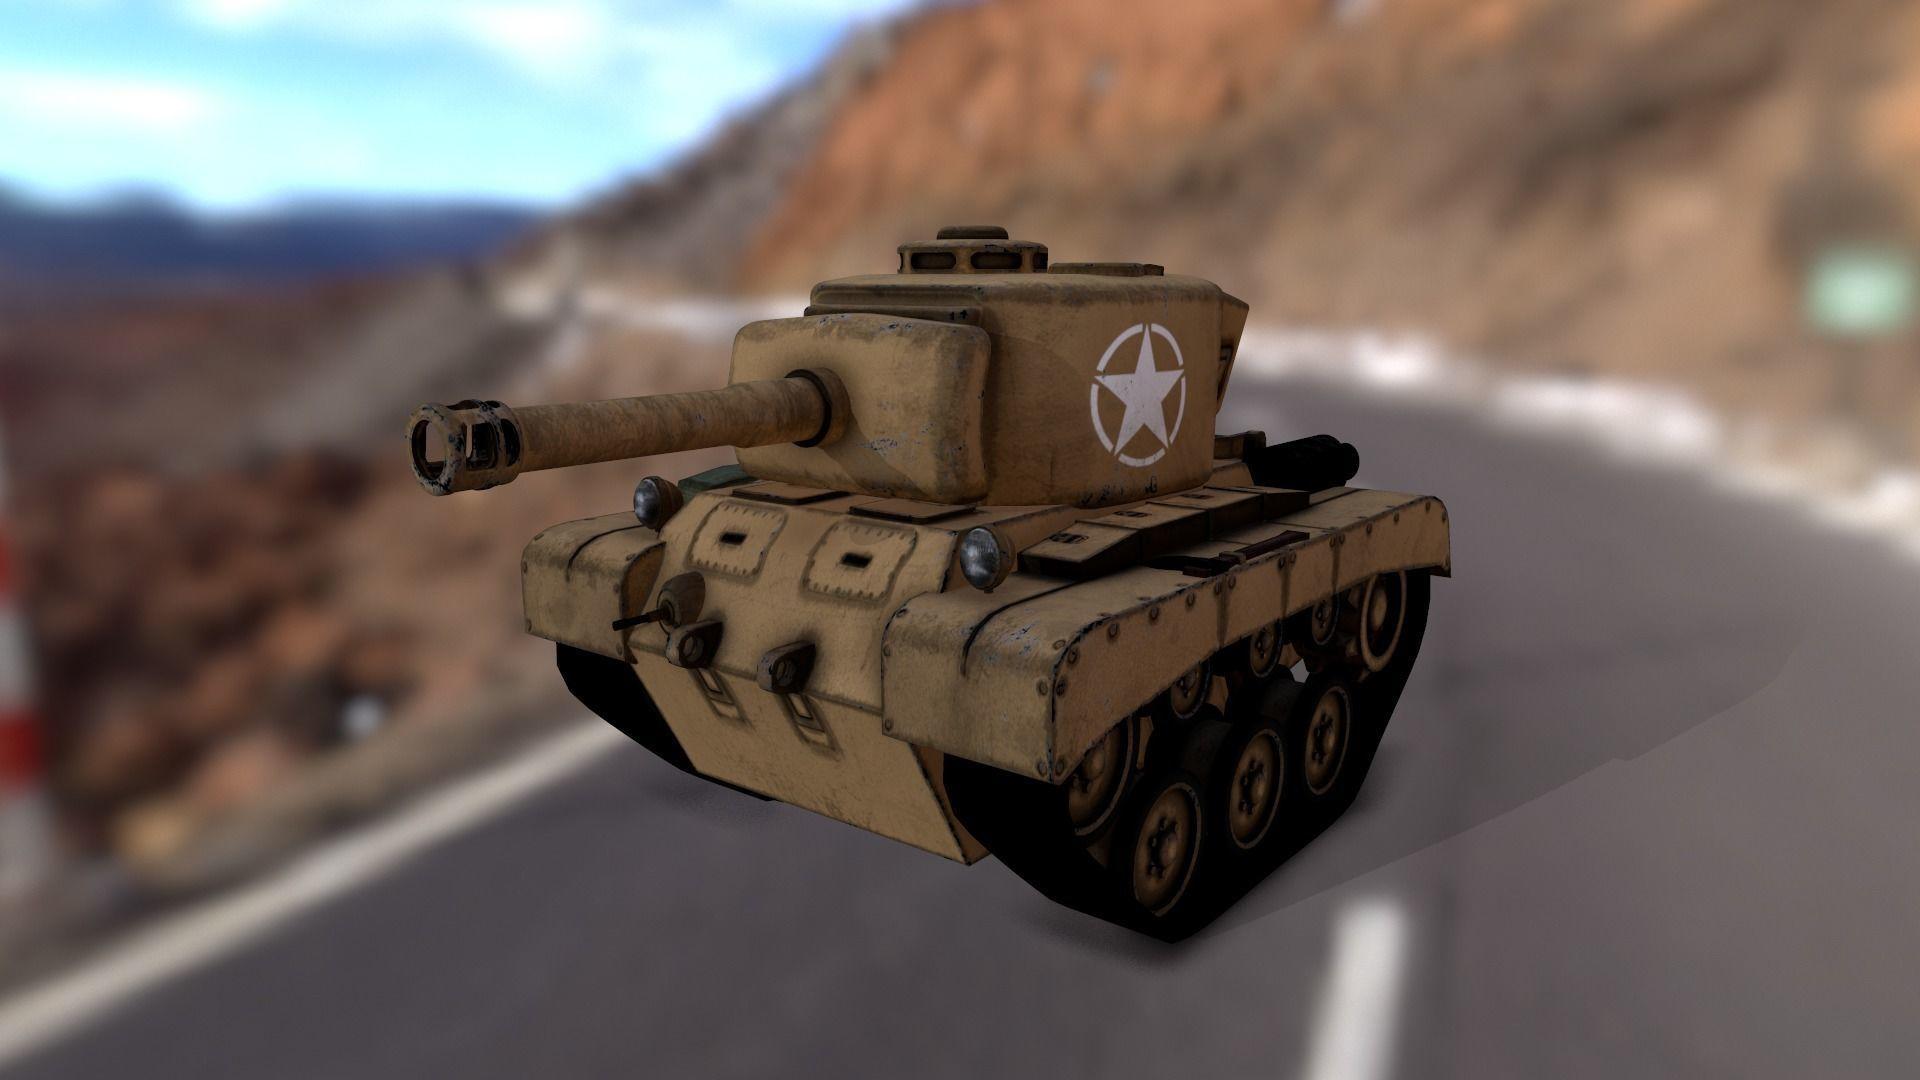 Stylized cartoon tank